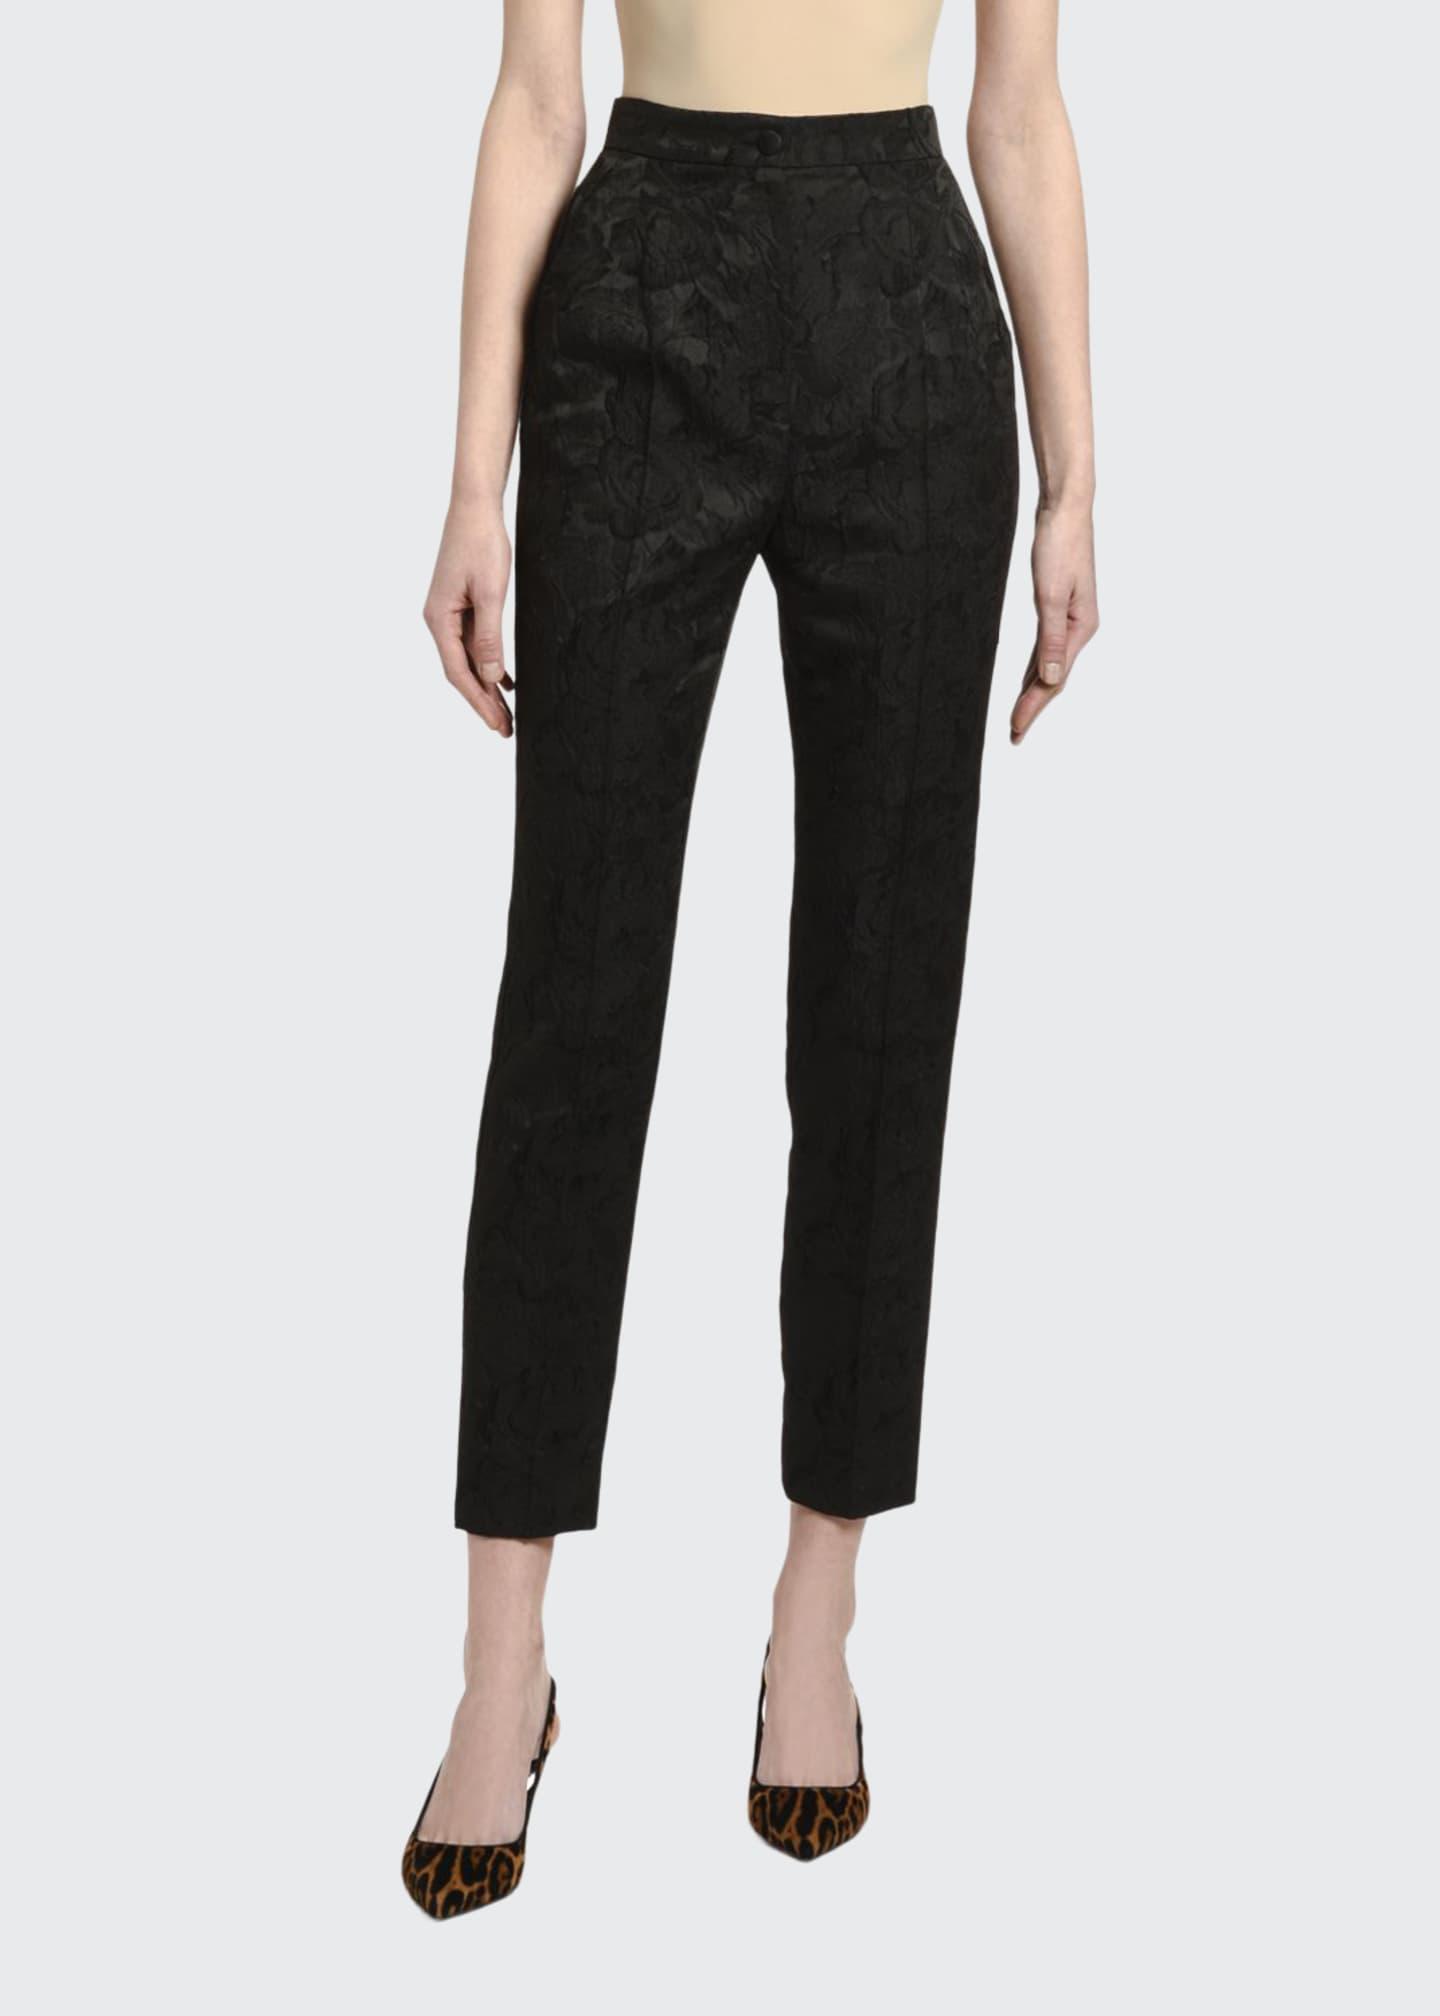 Dolce & Gabbana Floral-Jacquard Slim-Leg Pants